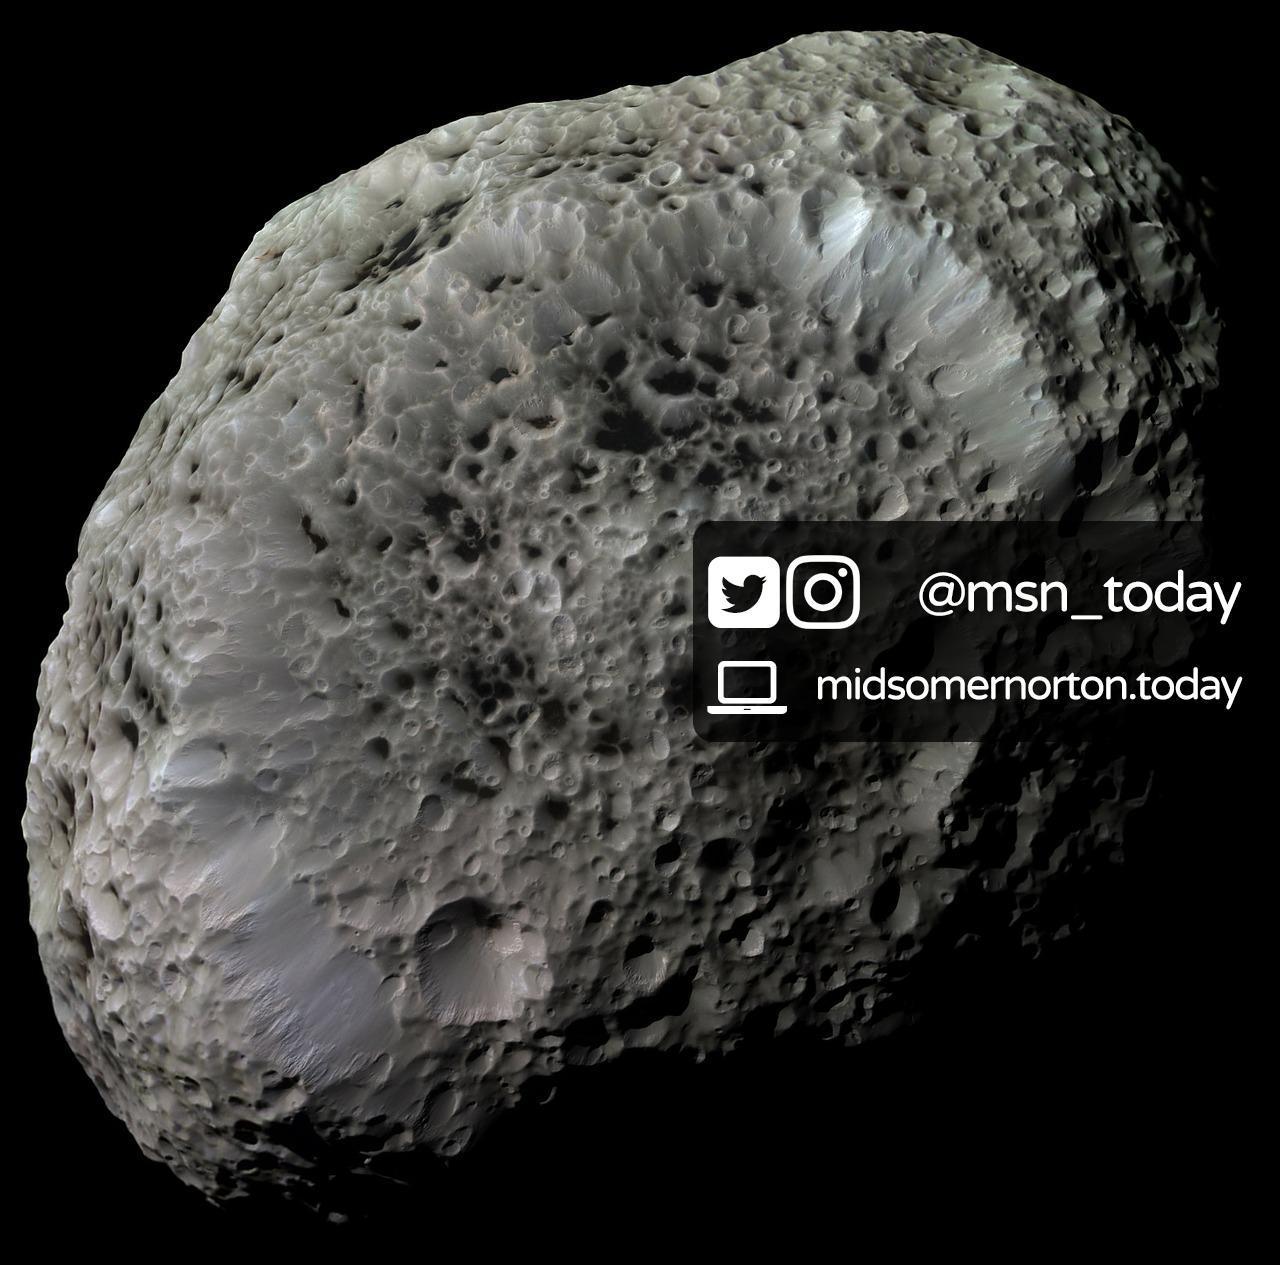 Asteroid Midsomer Norton